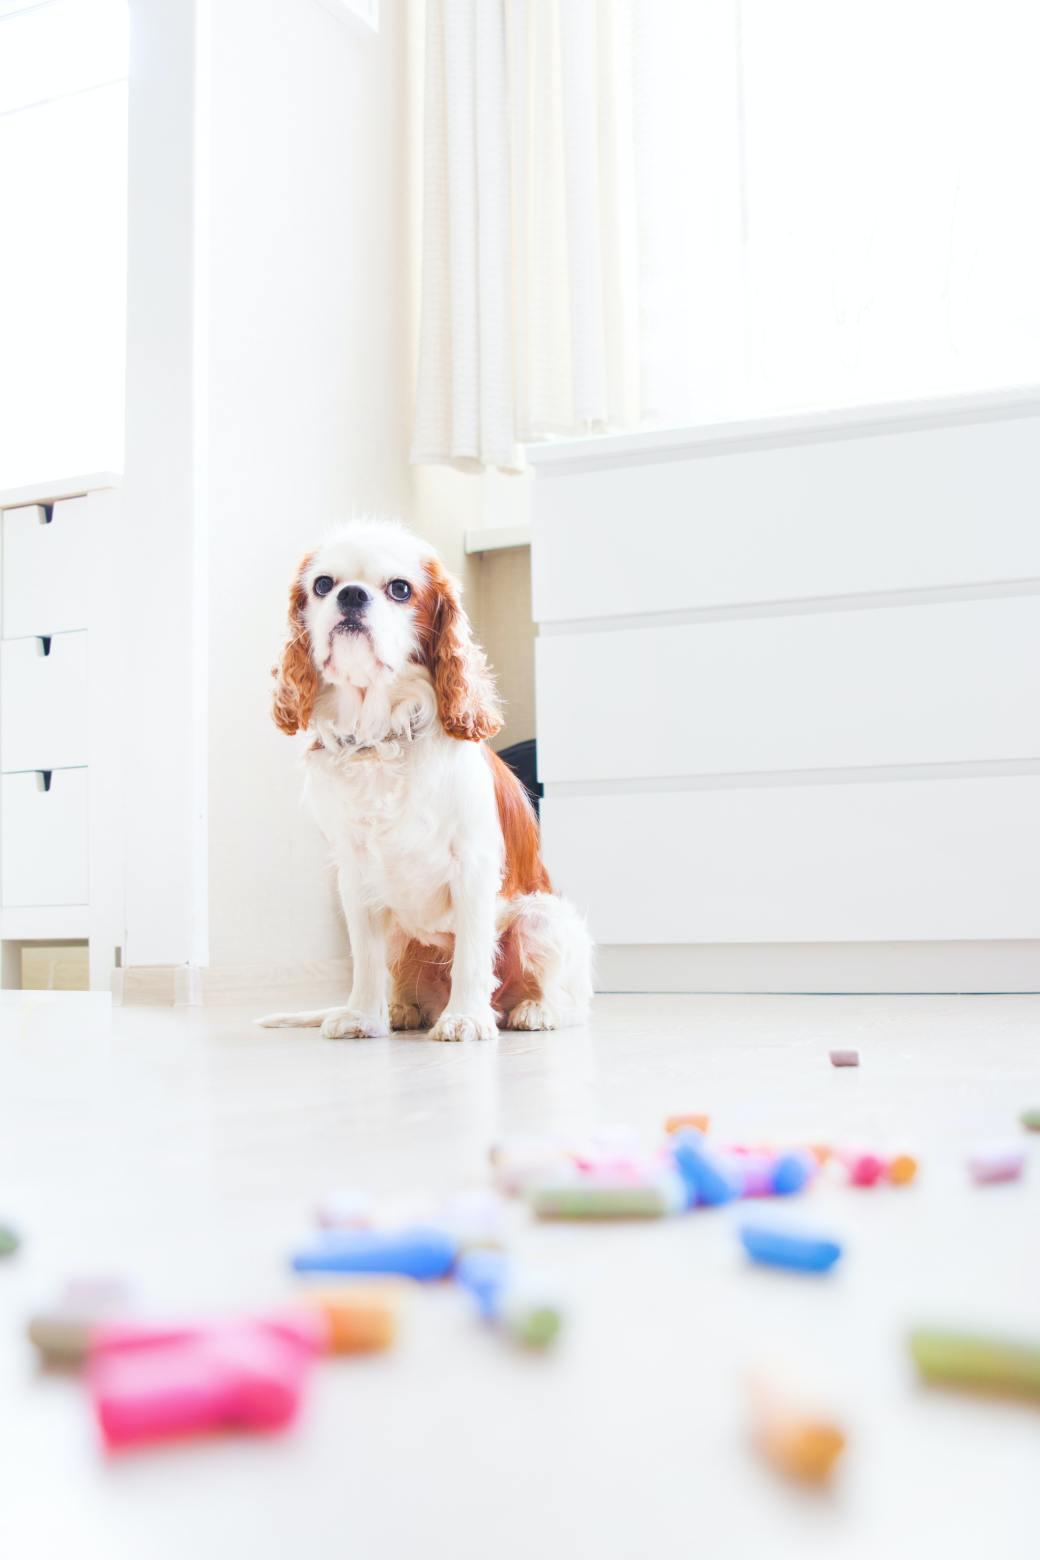 pet-dog-sitting-down-on-floor-1975521